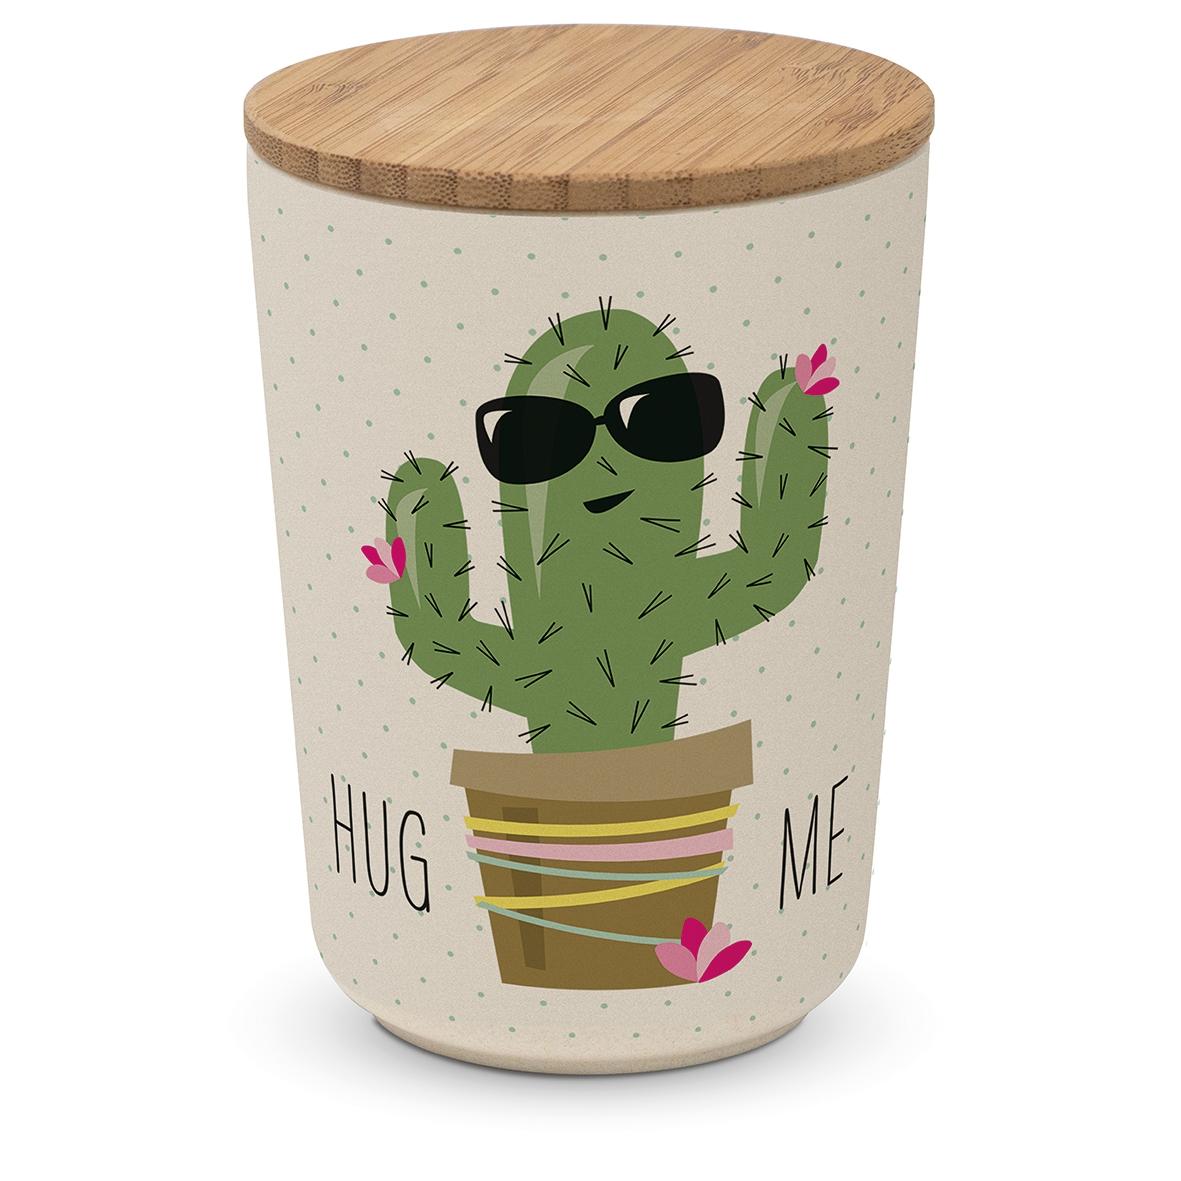 Bamboo Storage - Hug Me Cactus